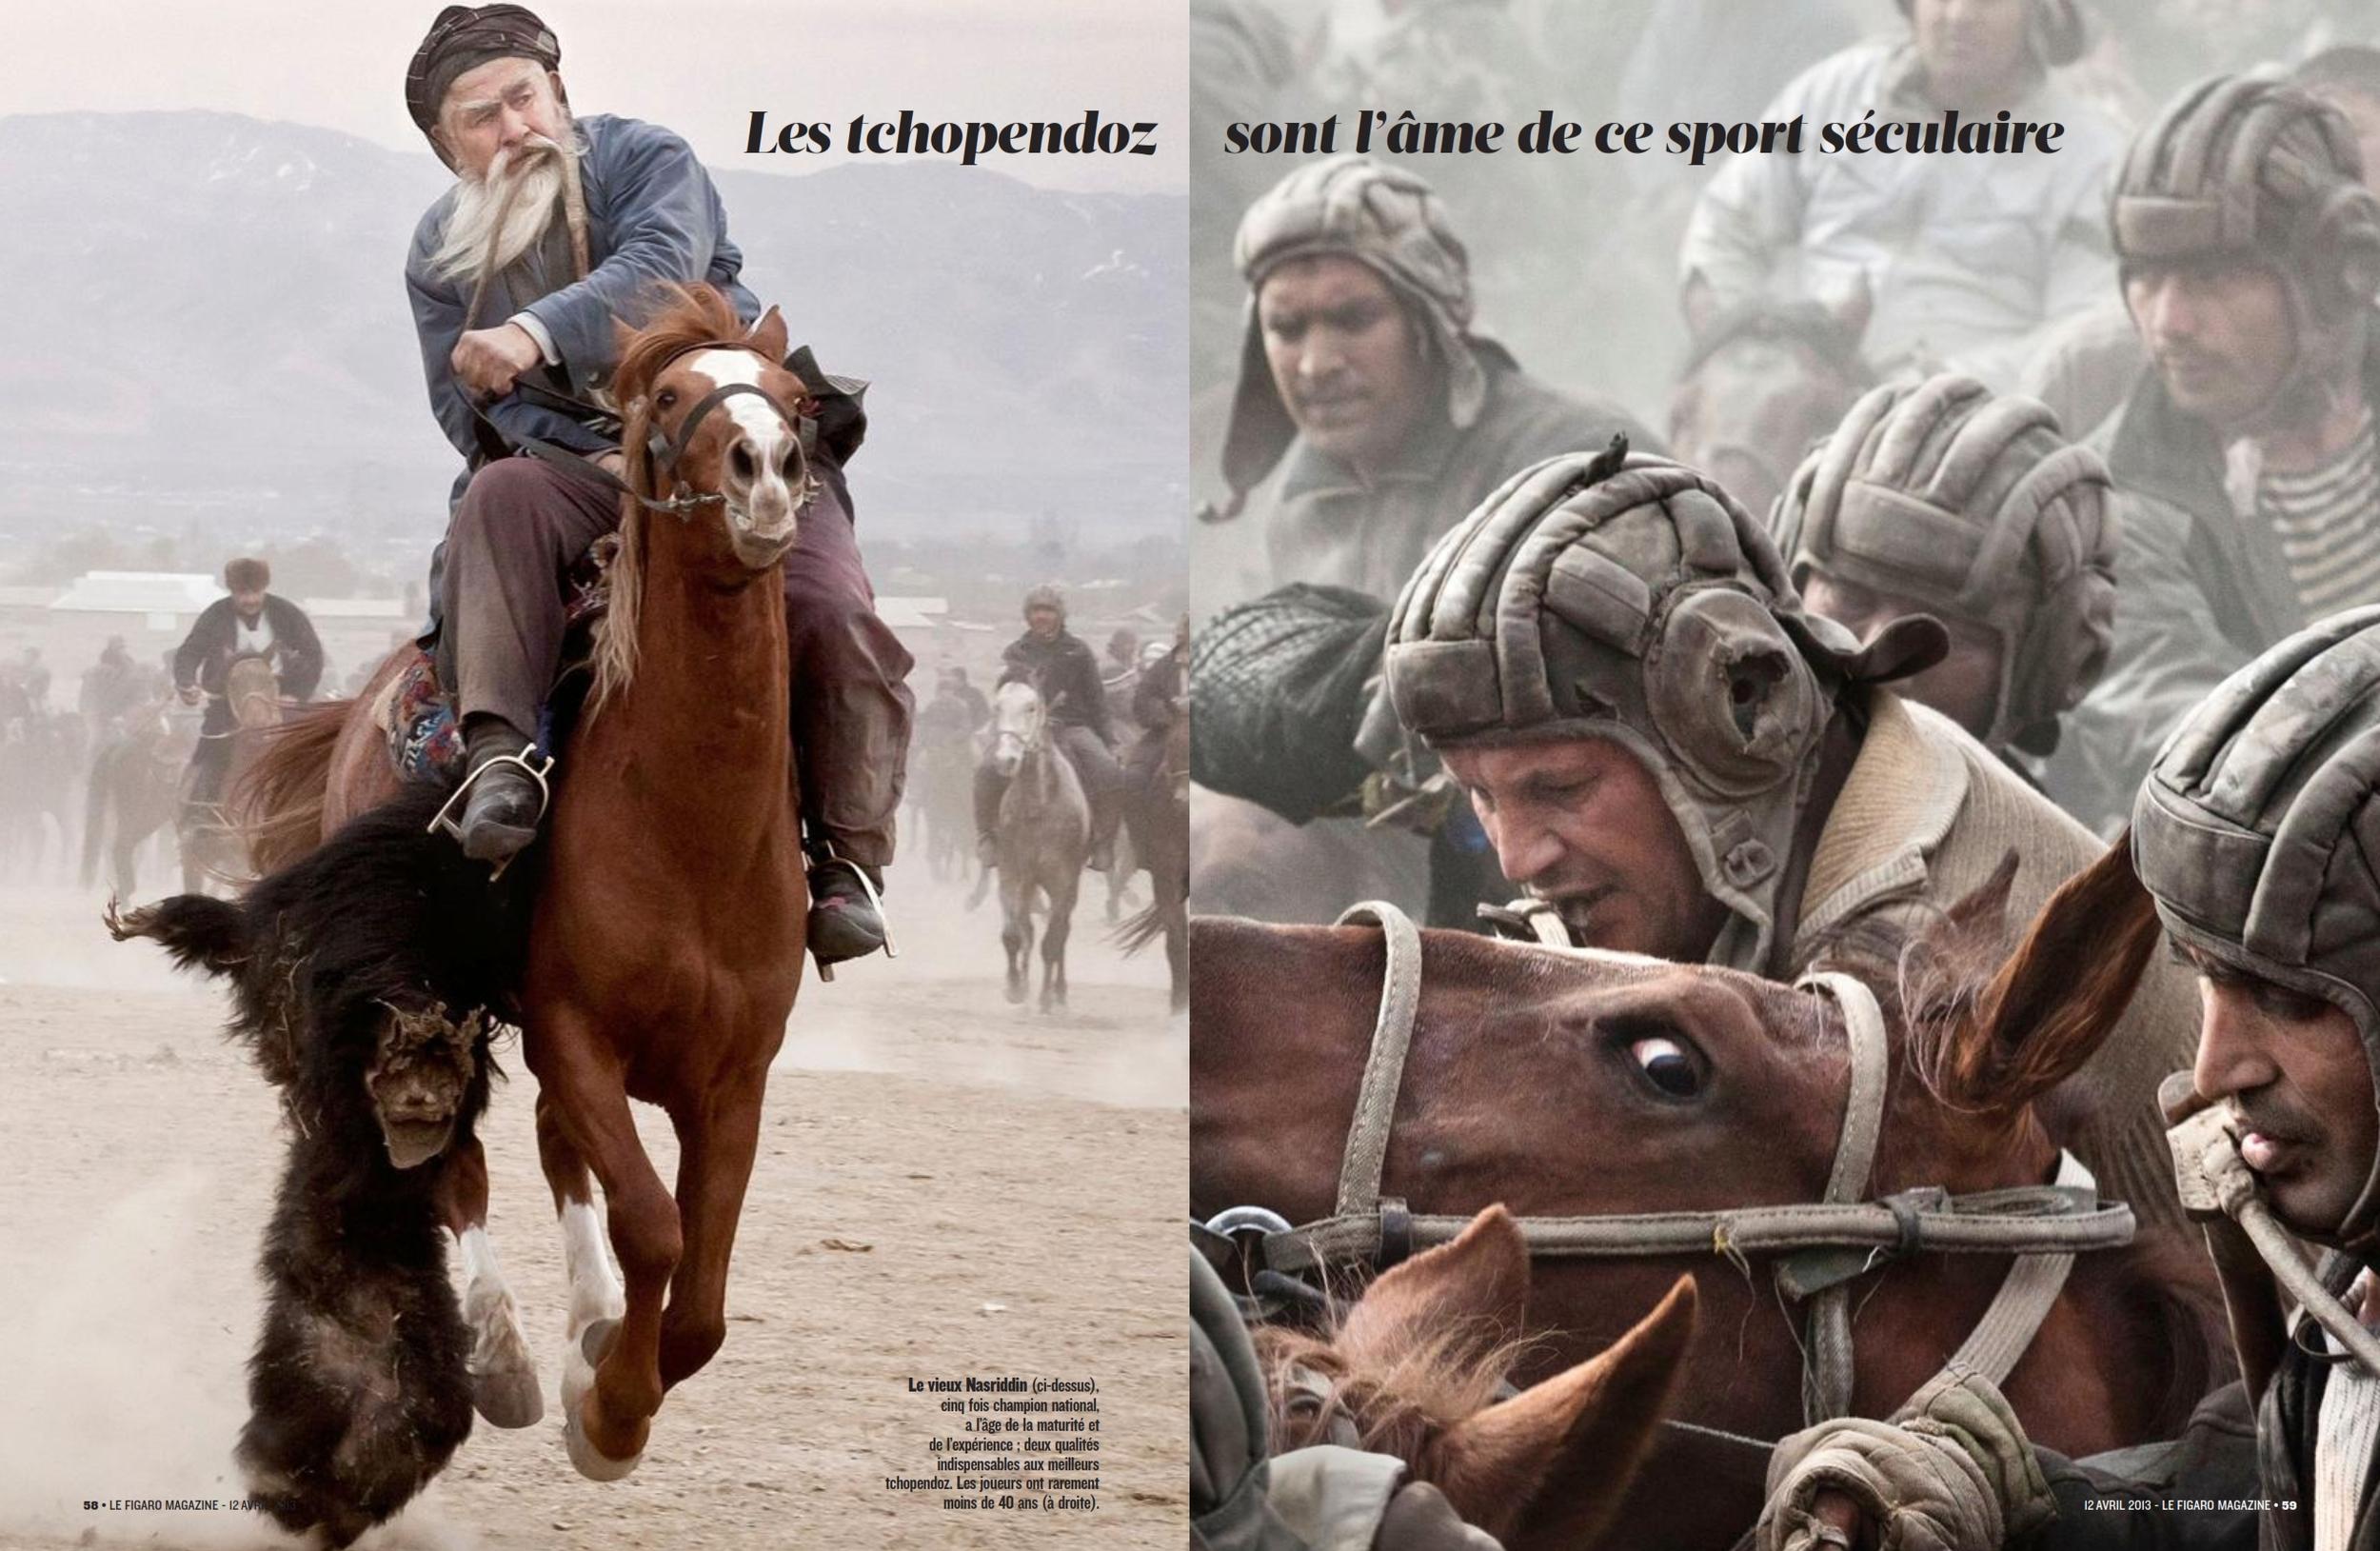 Le Figaro mag-21365-p056-062_002.jpg